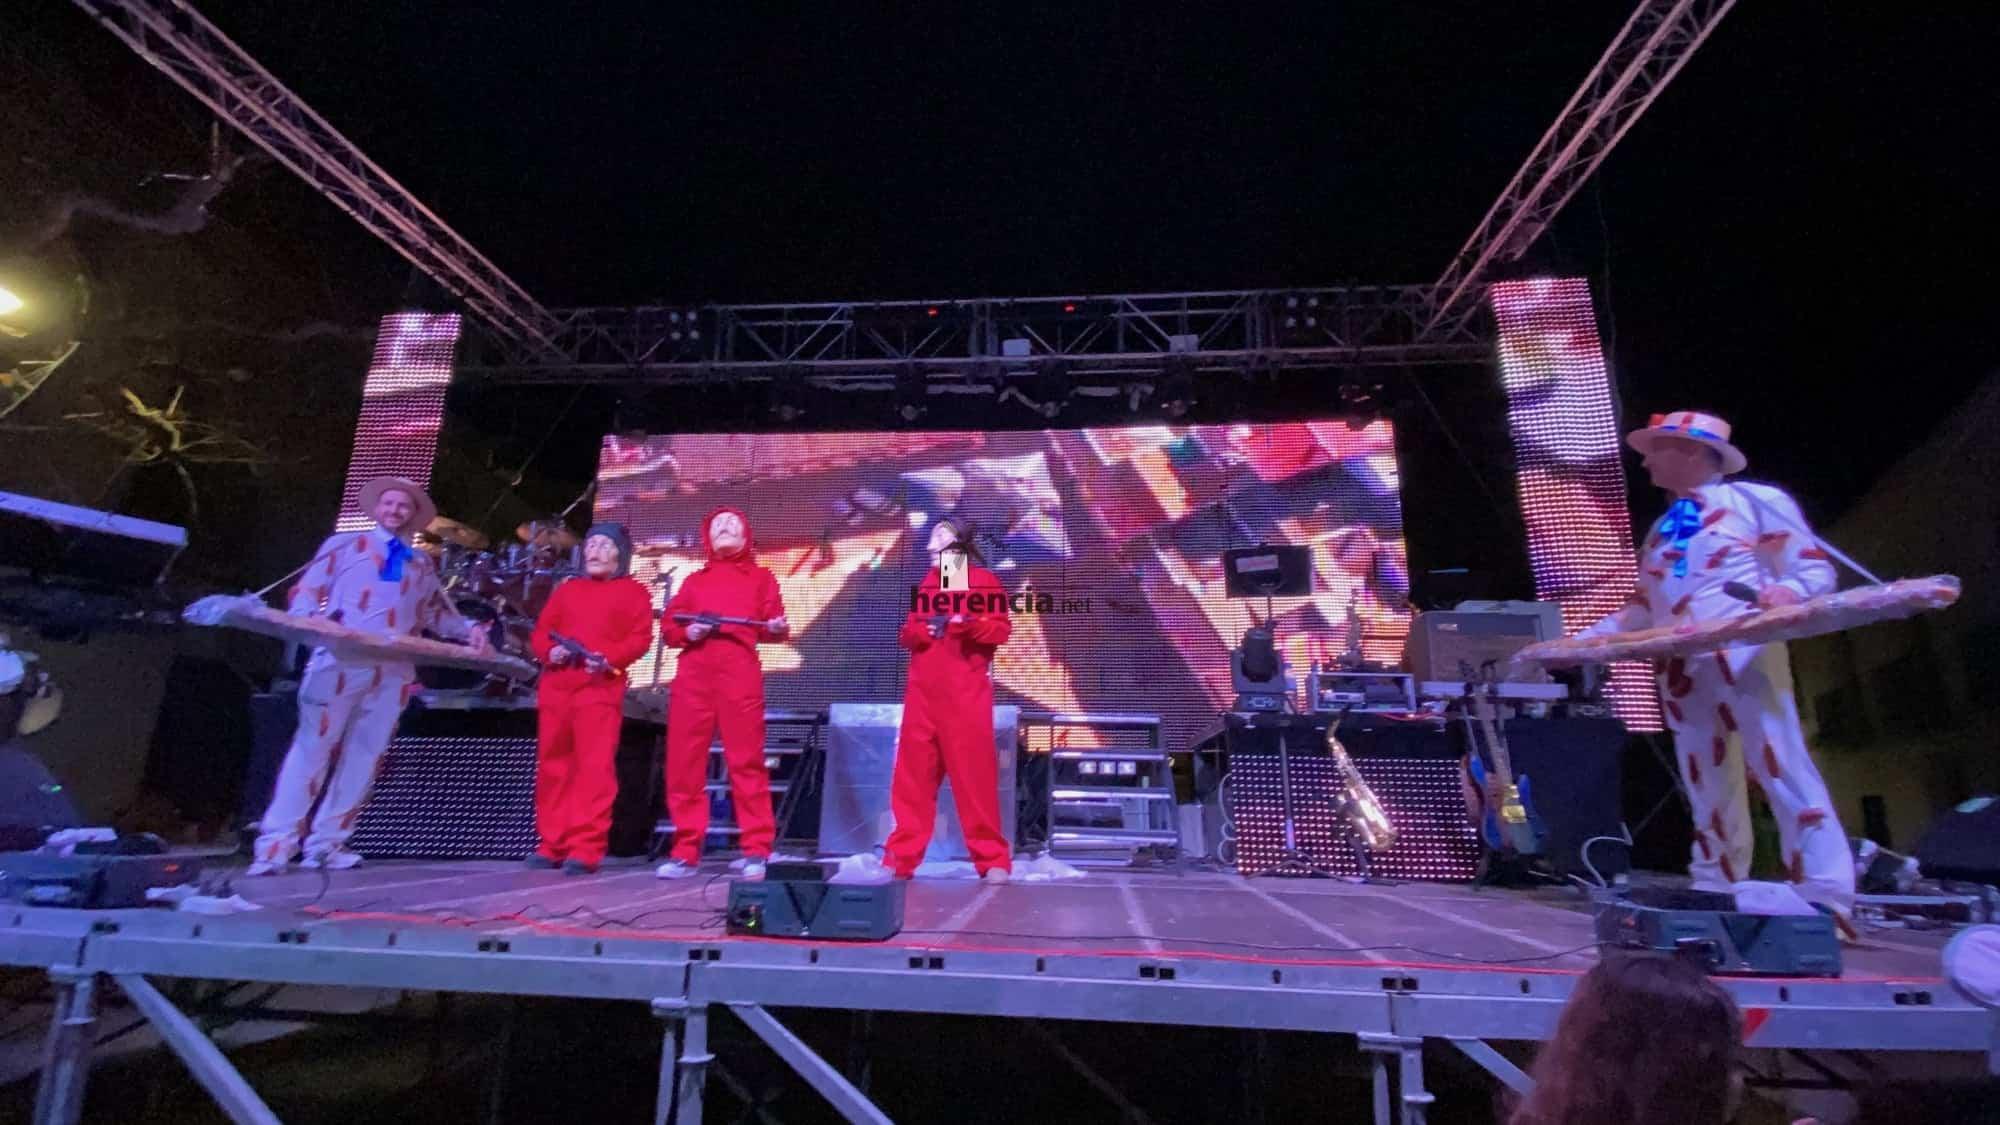 Carnaval de herencia 2019 sabados ansiosos 7 - Inaugurado el Carnaval de Herencia 2020 con el Sábado de los Ansiosos